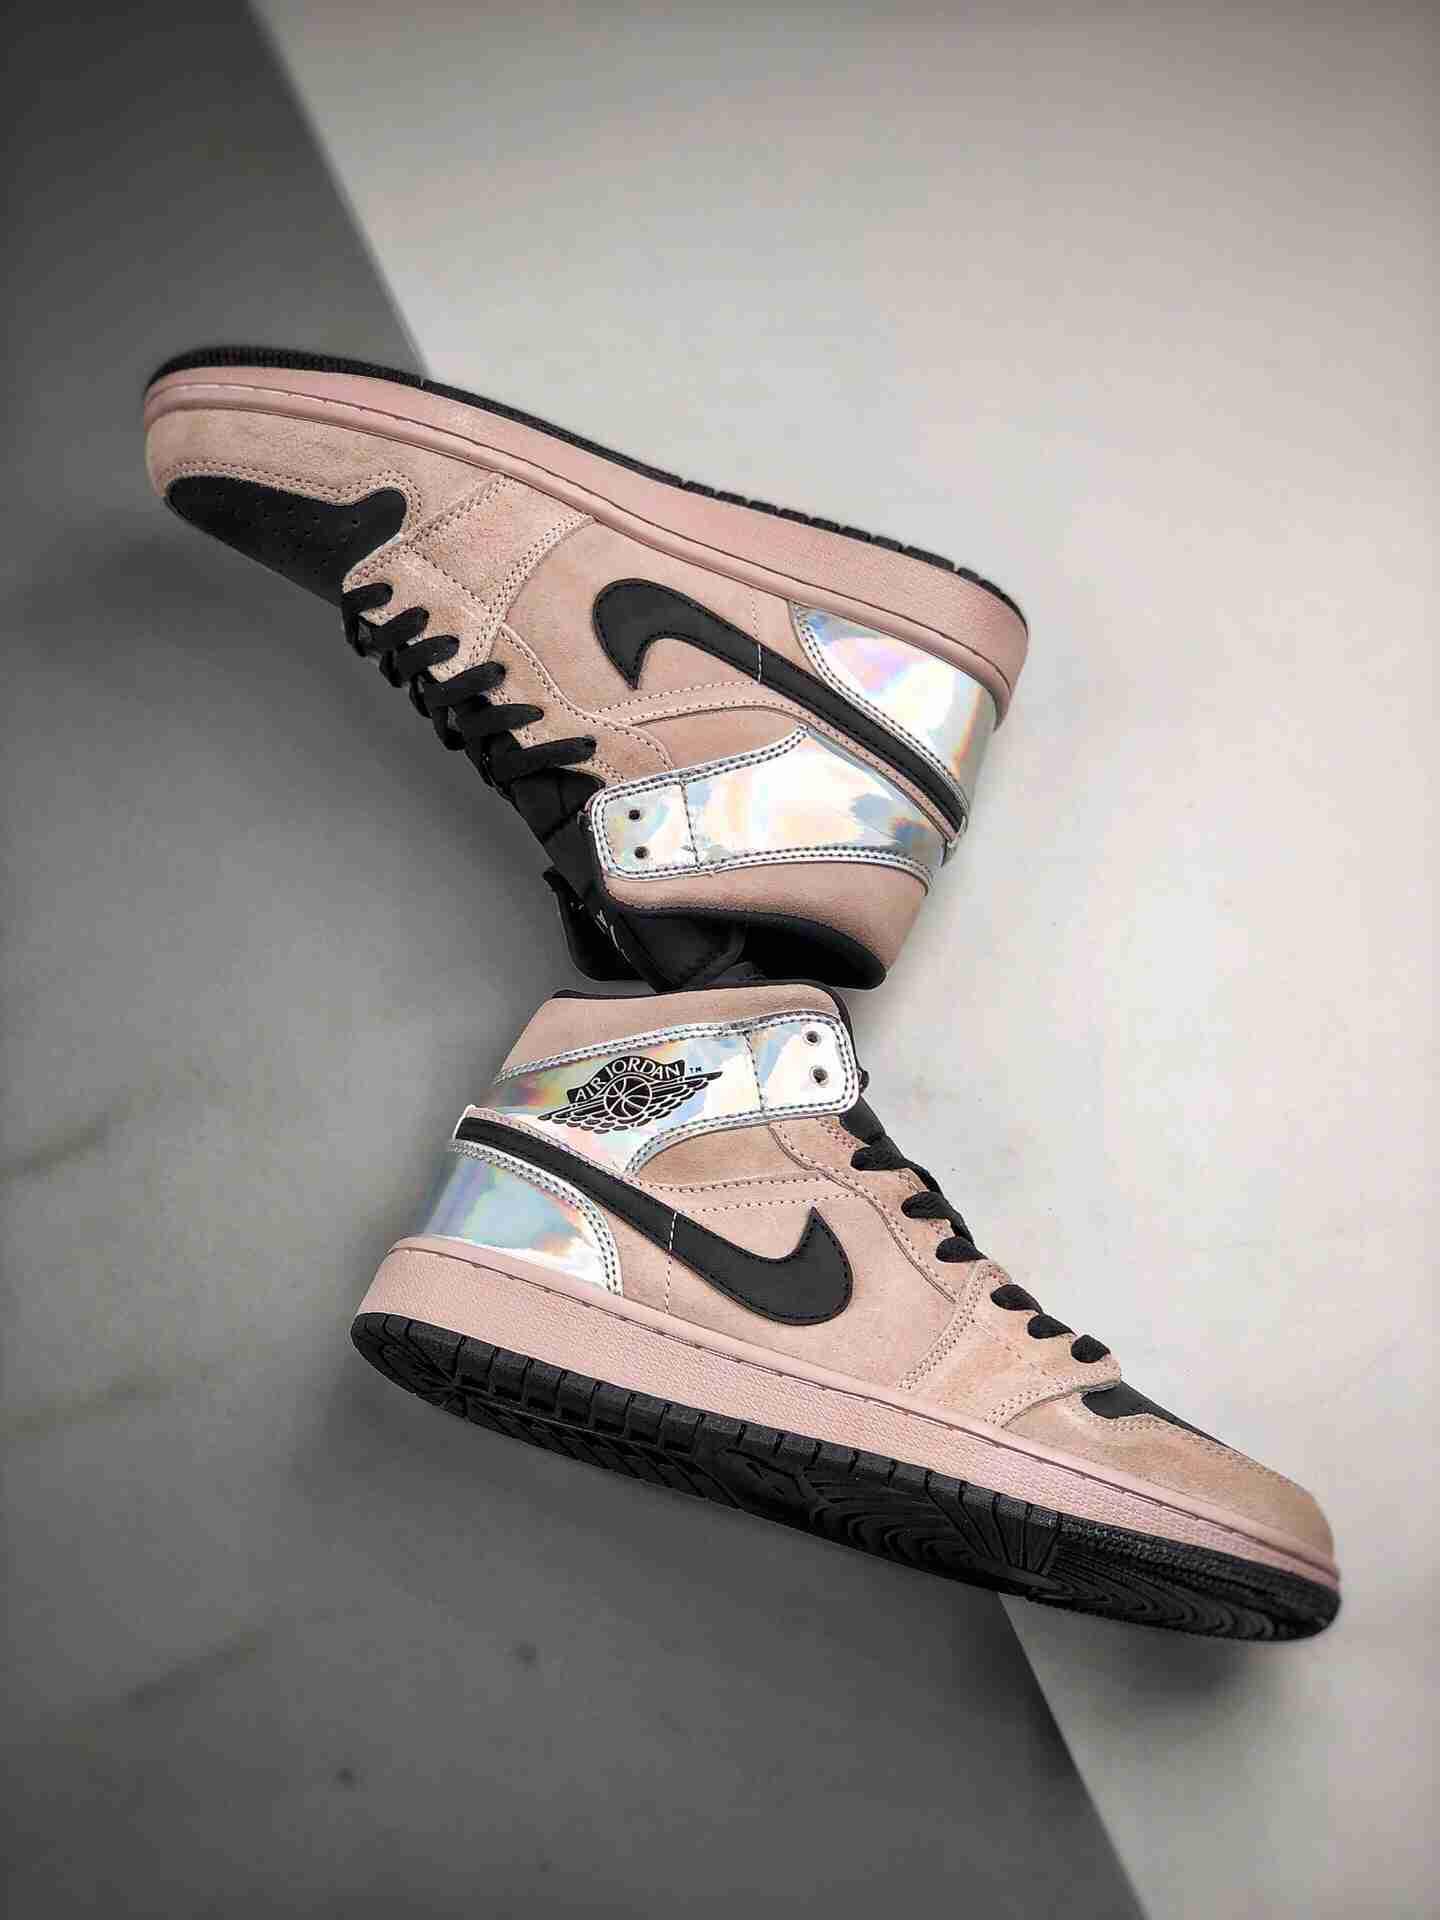 Air Jordan 1 Mid  脏粉镭射 中帮系列